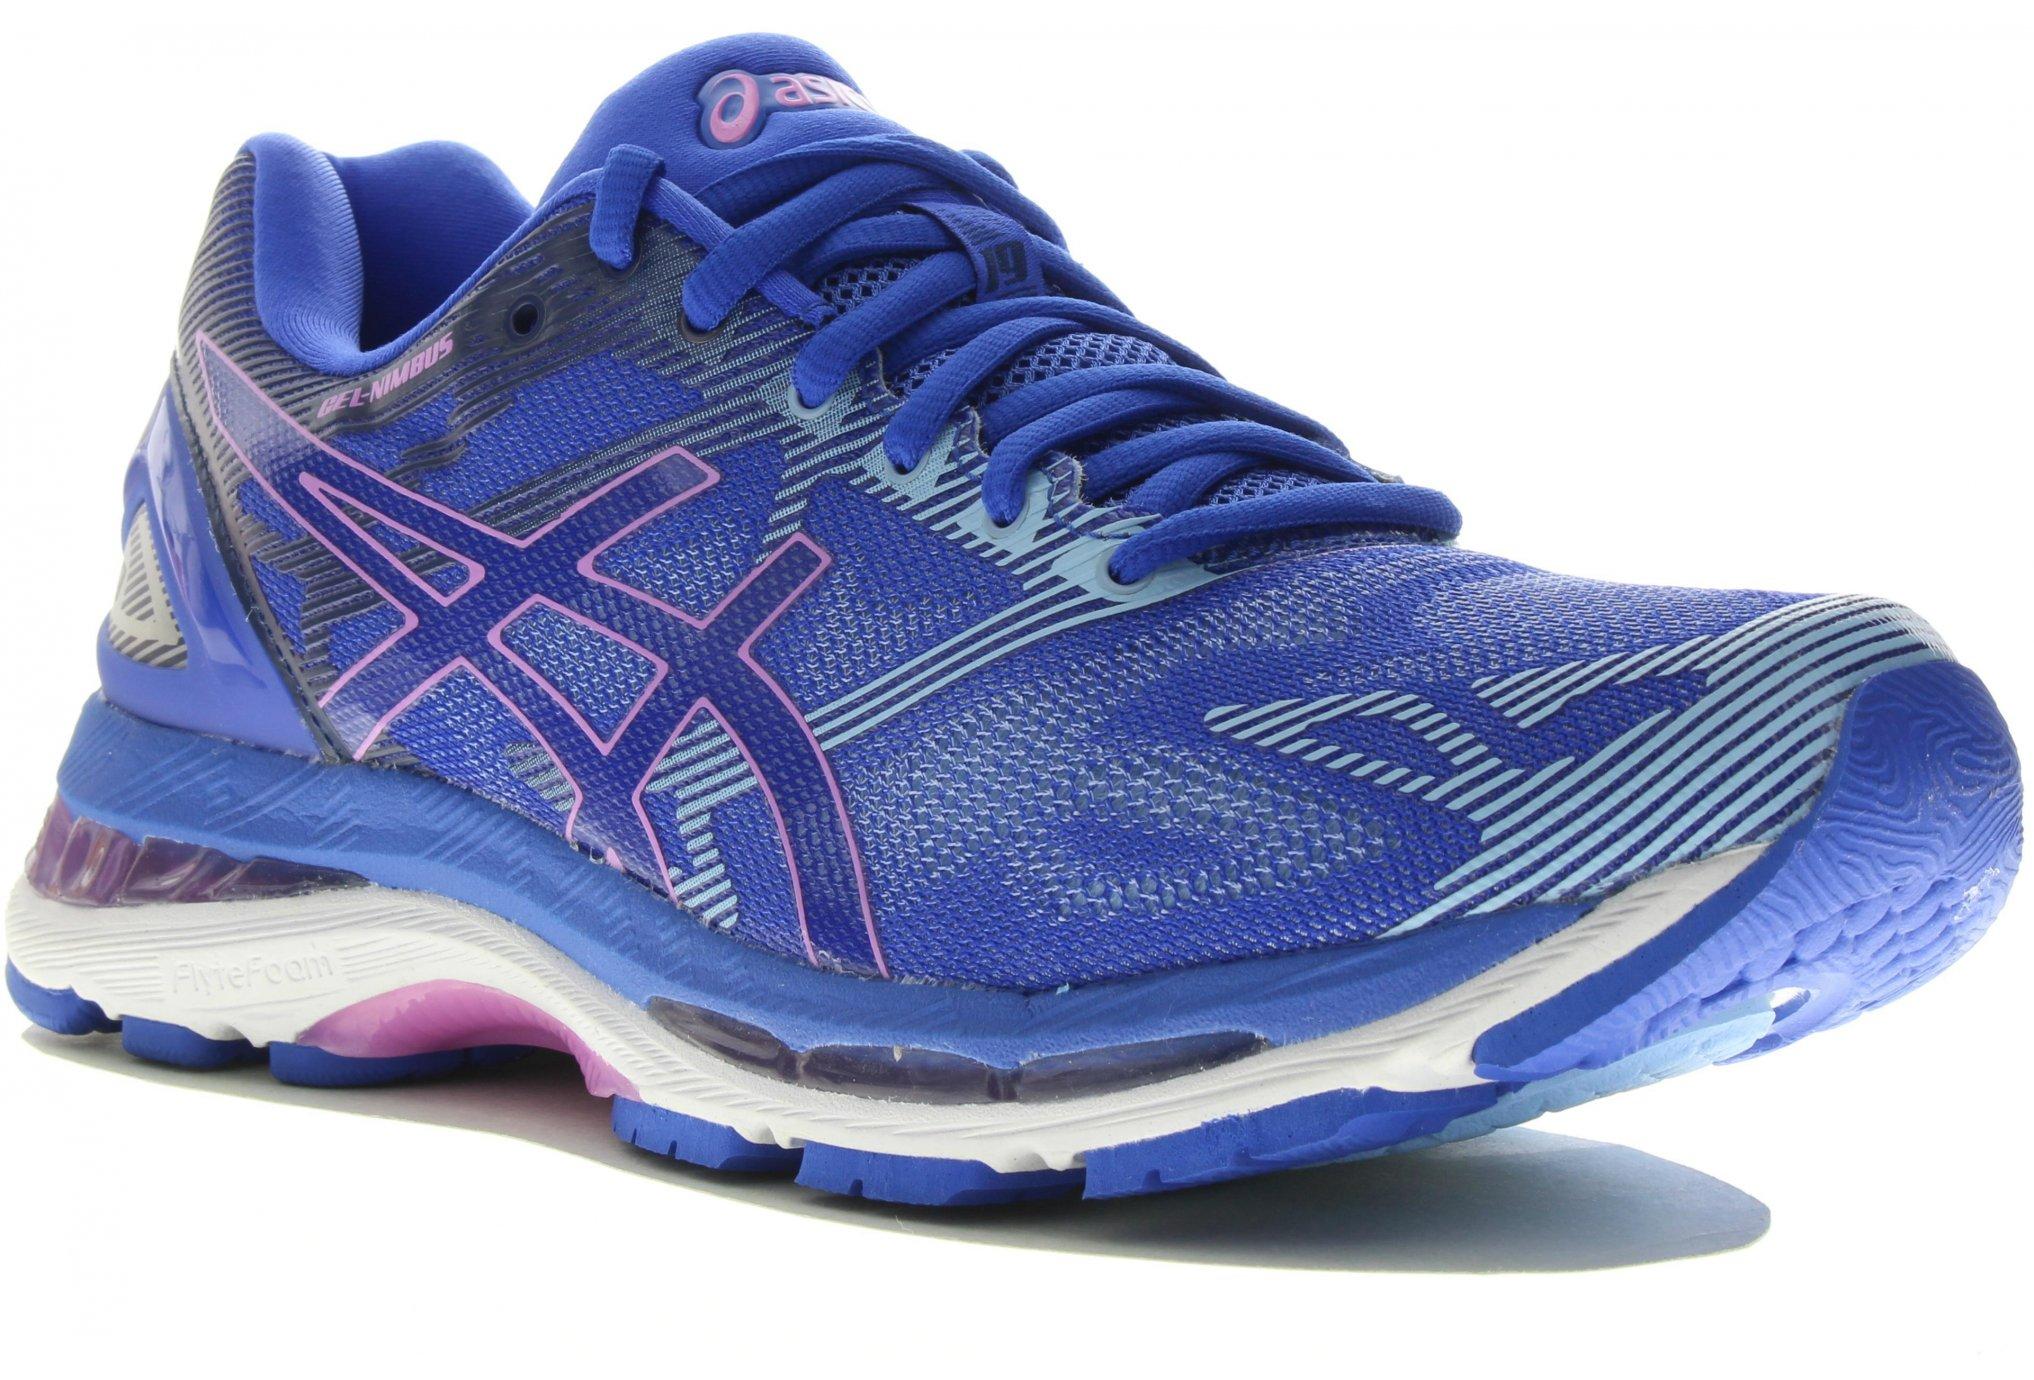 Nv0wnp8ymo 19 Nimbus Running Chaussures Gel Asics W Resathlon Femme BeordCx